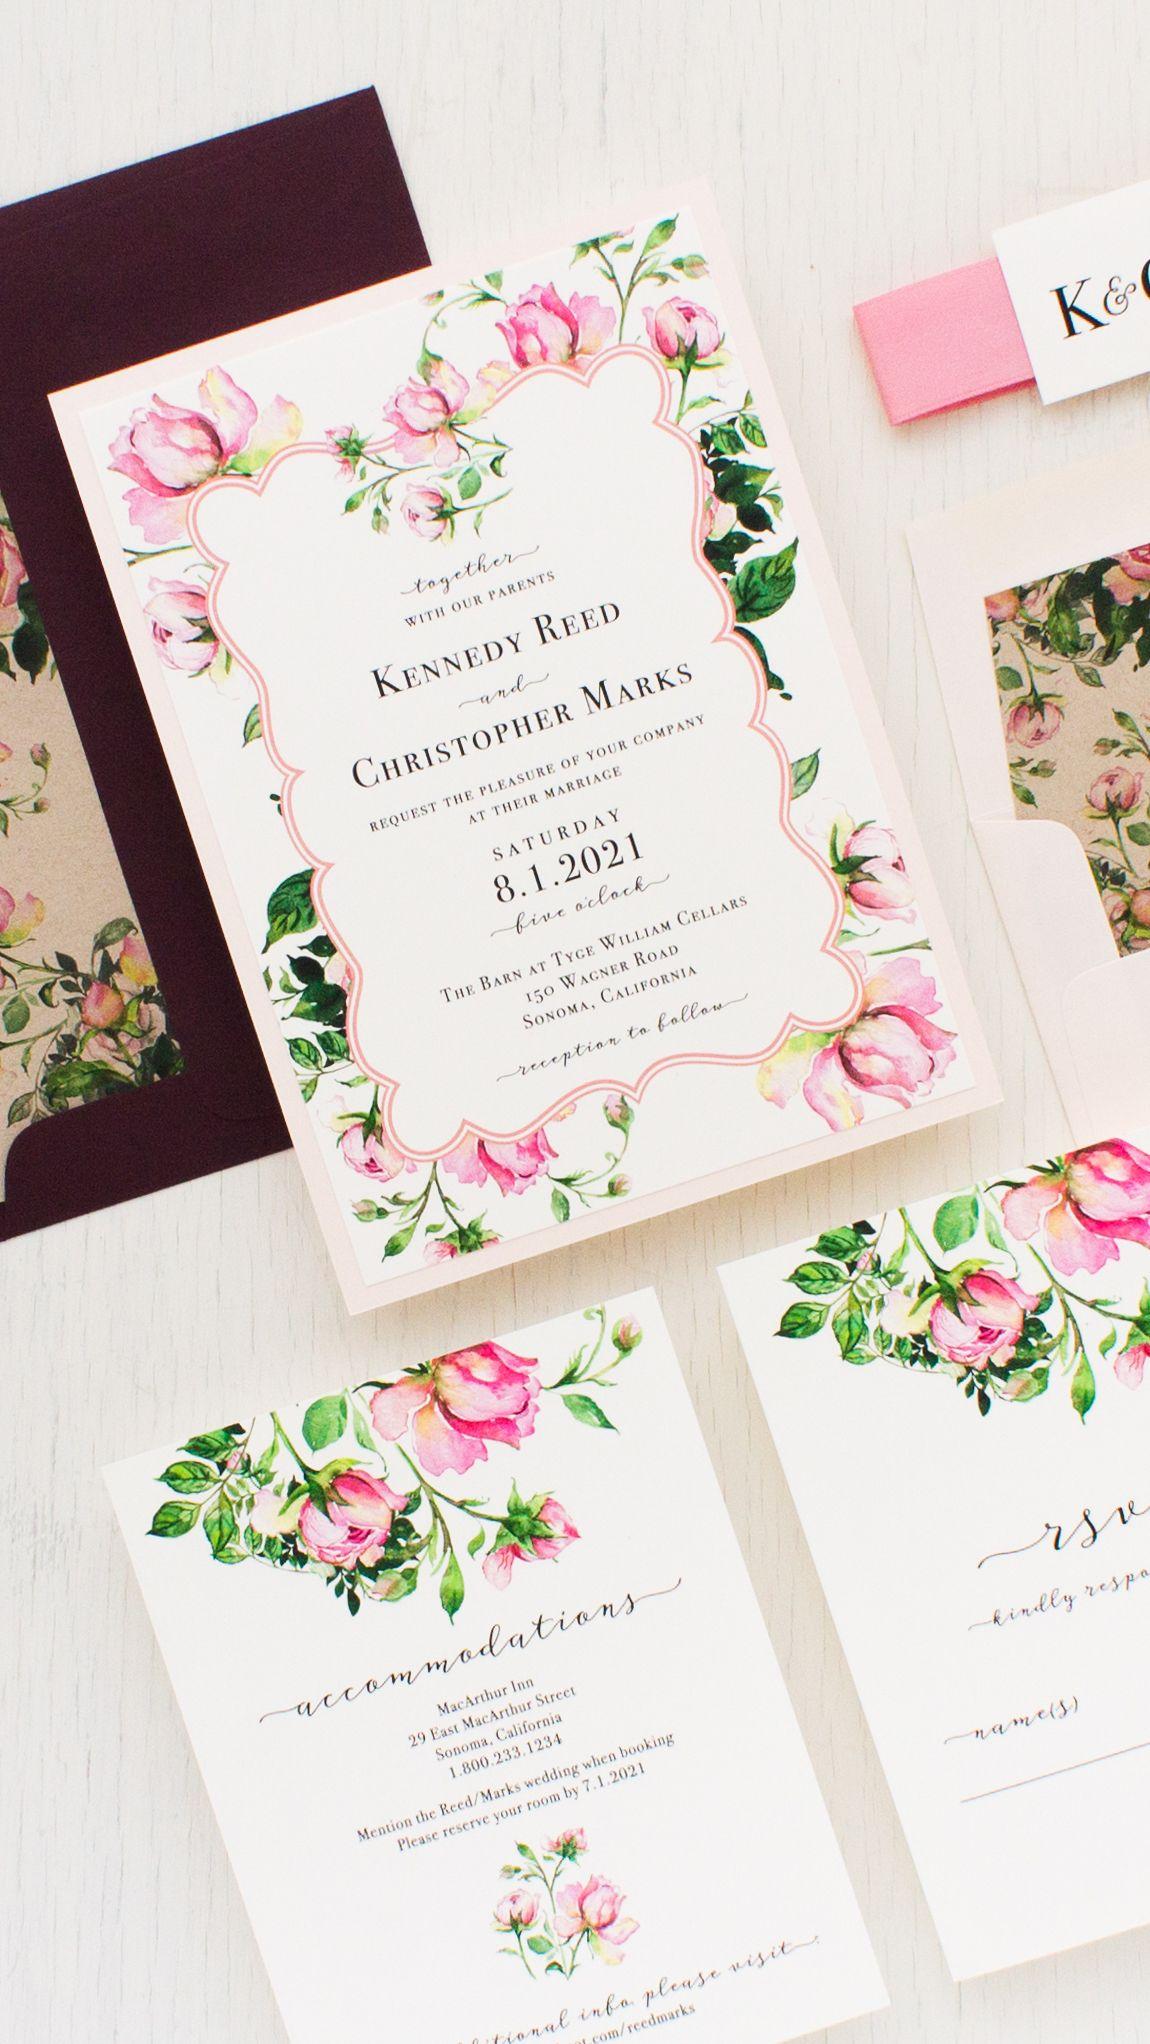 Dusty Rose Wedding Invitations Burgundy Pink Beacon Lane Wedding Invitations Diy Wedding Invitations Rose Wedding Invitations